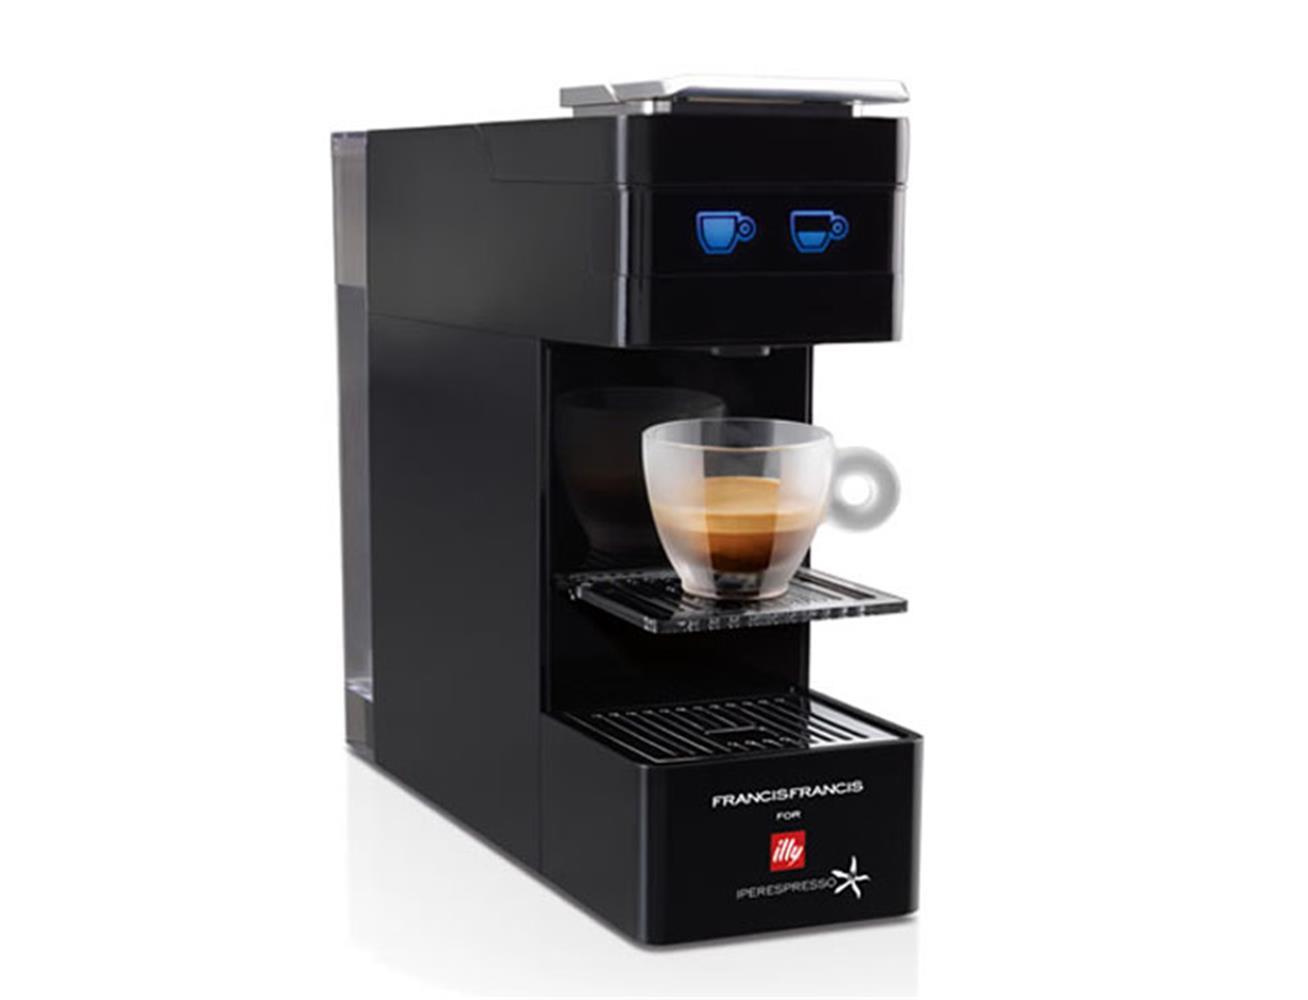 Illy Francis Y3 Iperespresso Coffee Machine - Best Price Online ...